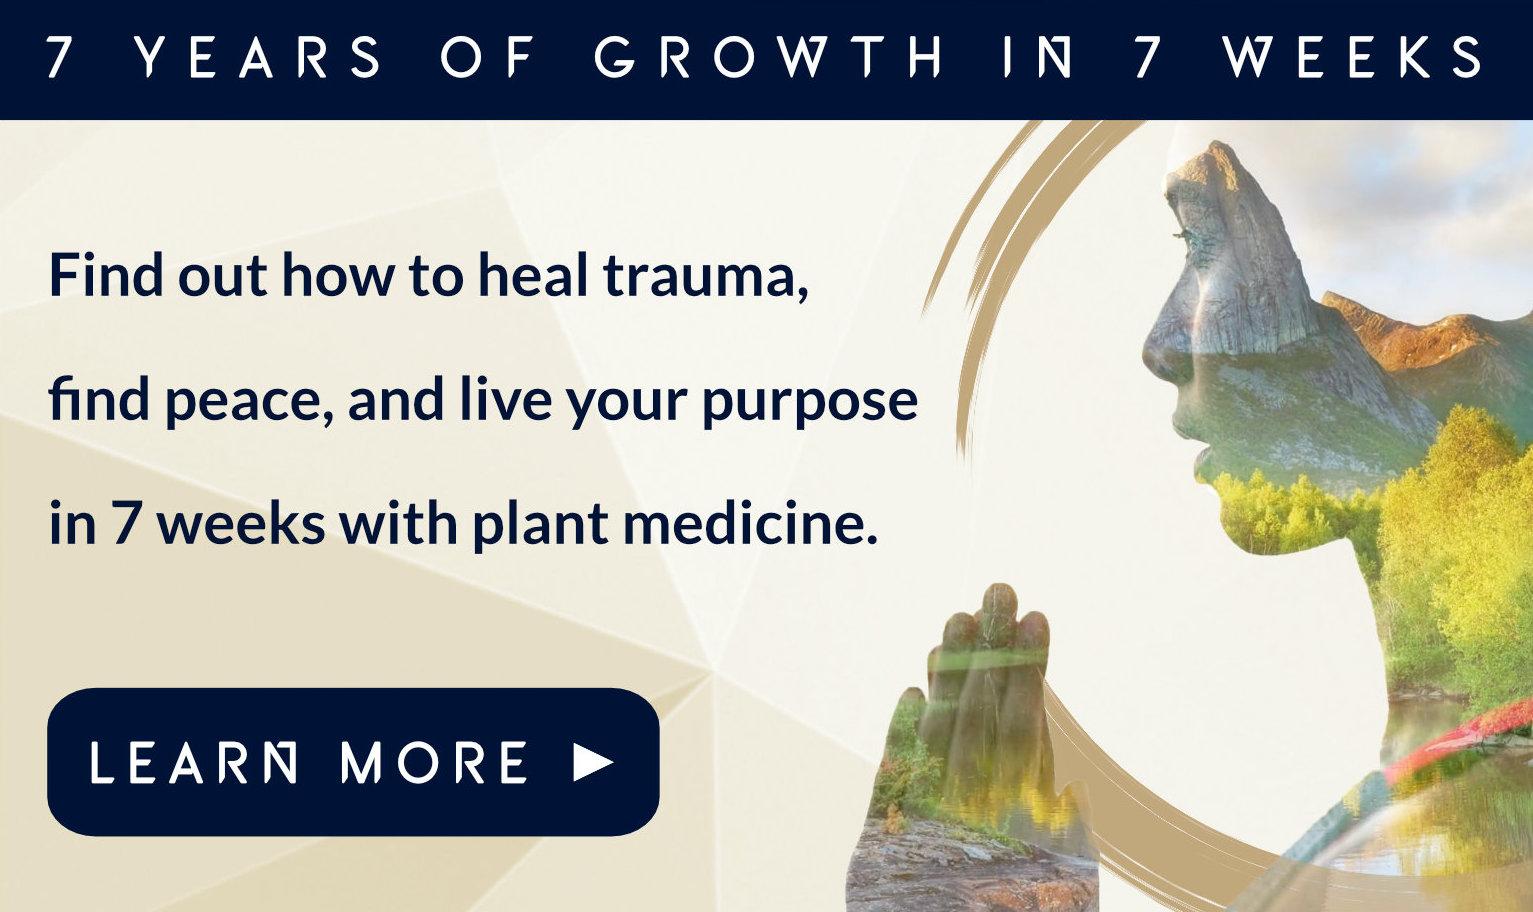 Webinar: 7 years growth in 7 weeks. Psychedelics, retreats, healing, transformation, purpose, ayahuasca, psilocybin, 5-MEO-DMT.